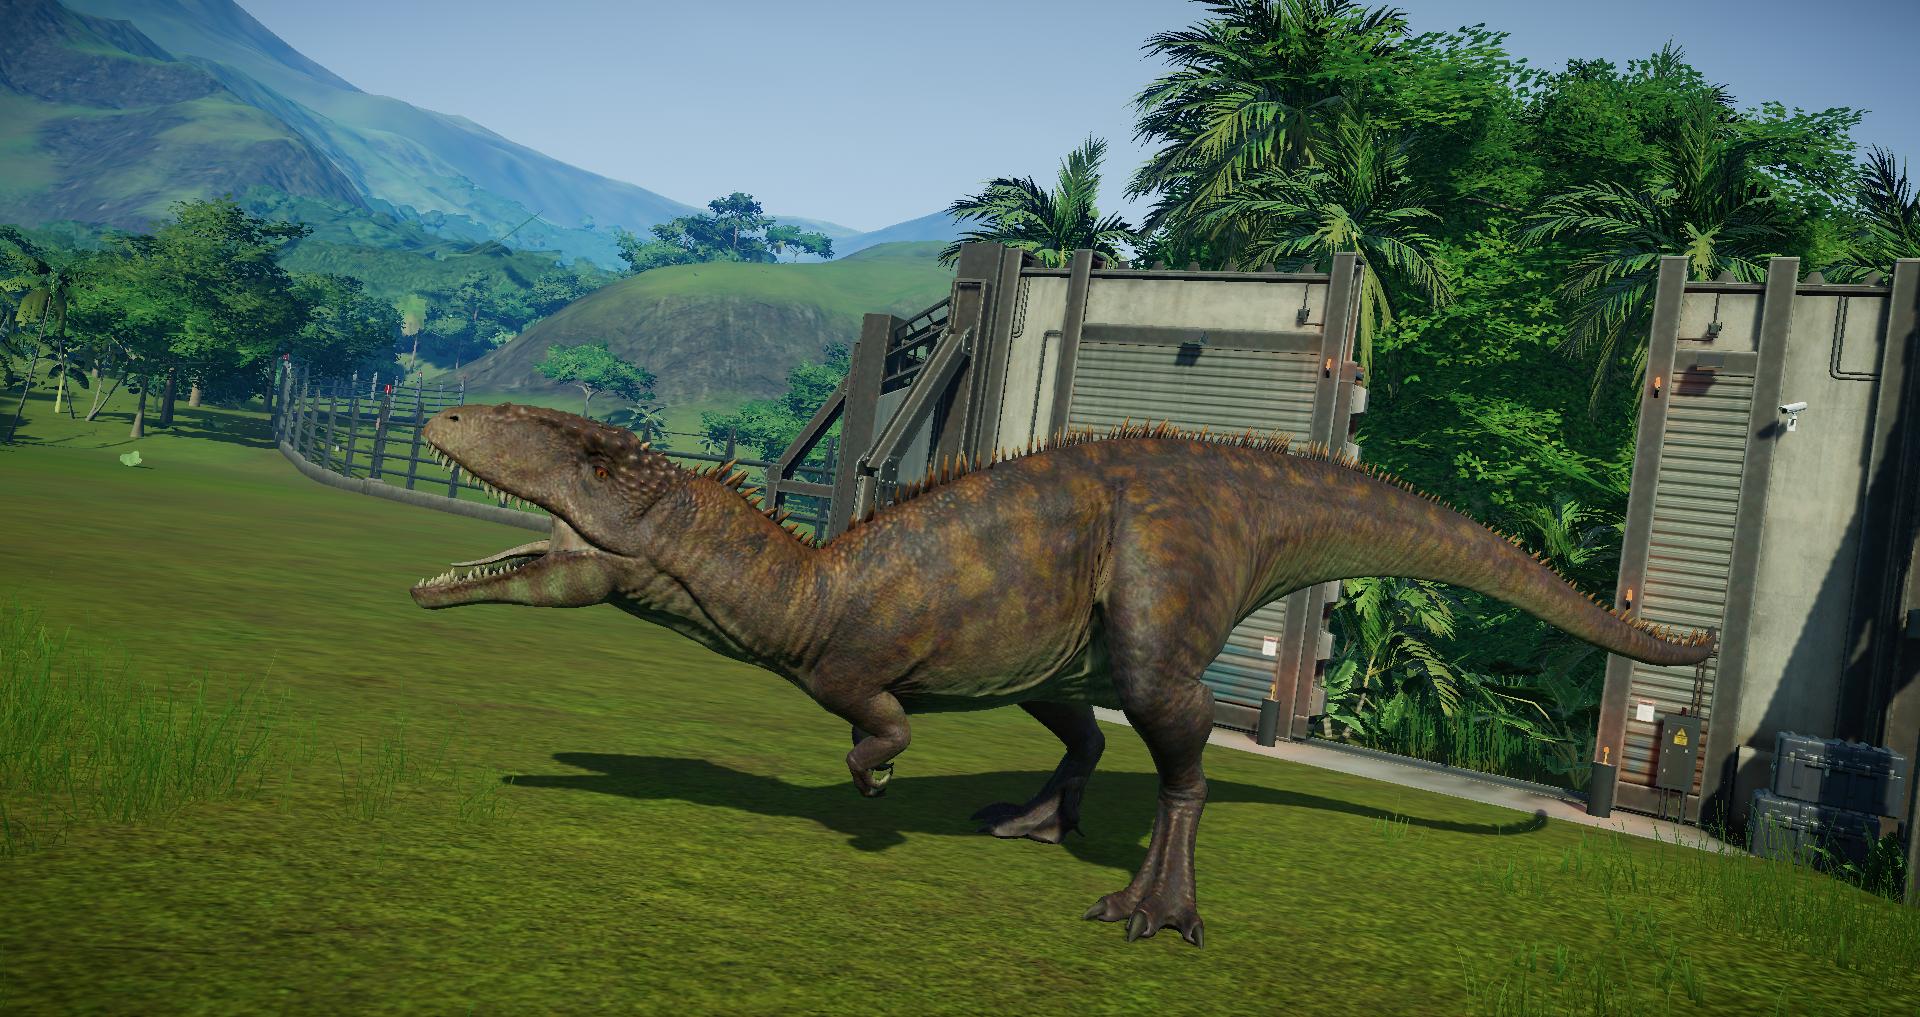 Carchar Addon Carcharodontosaurus Model Edit For Jurassic World Evolution Mod Db Update dinosaur textures at runtime. jurassic world evolution mod db